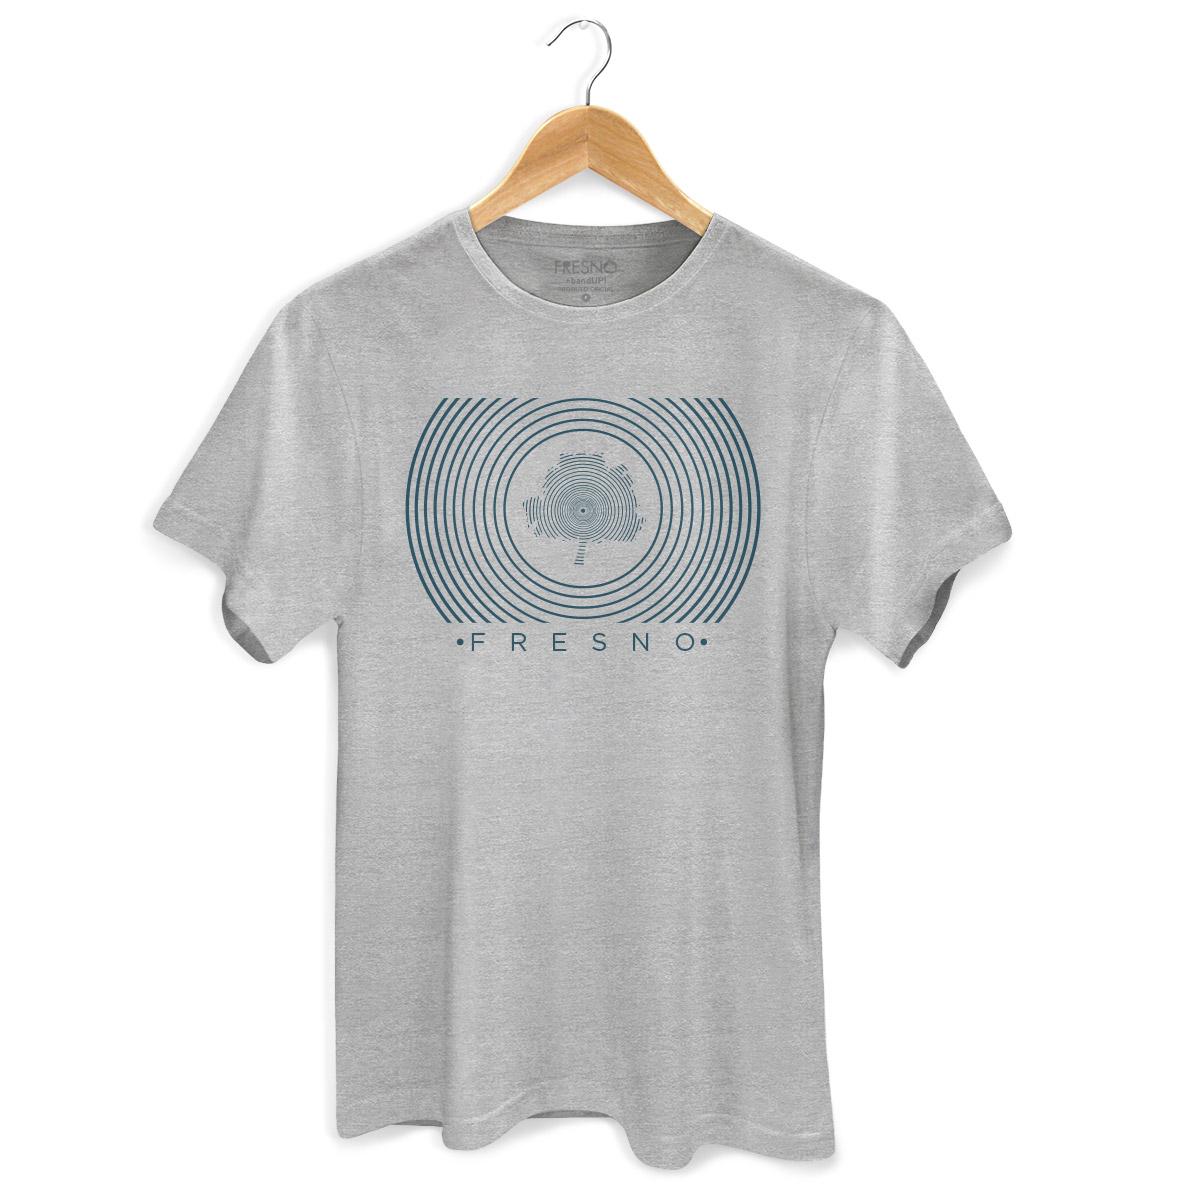 Camiseta Masculina Fresno Círculos